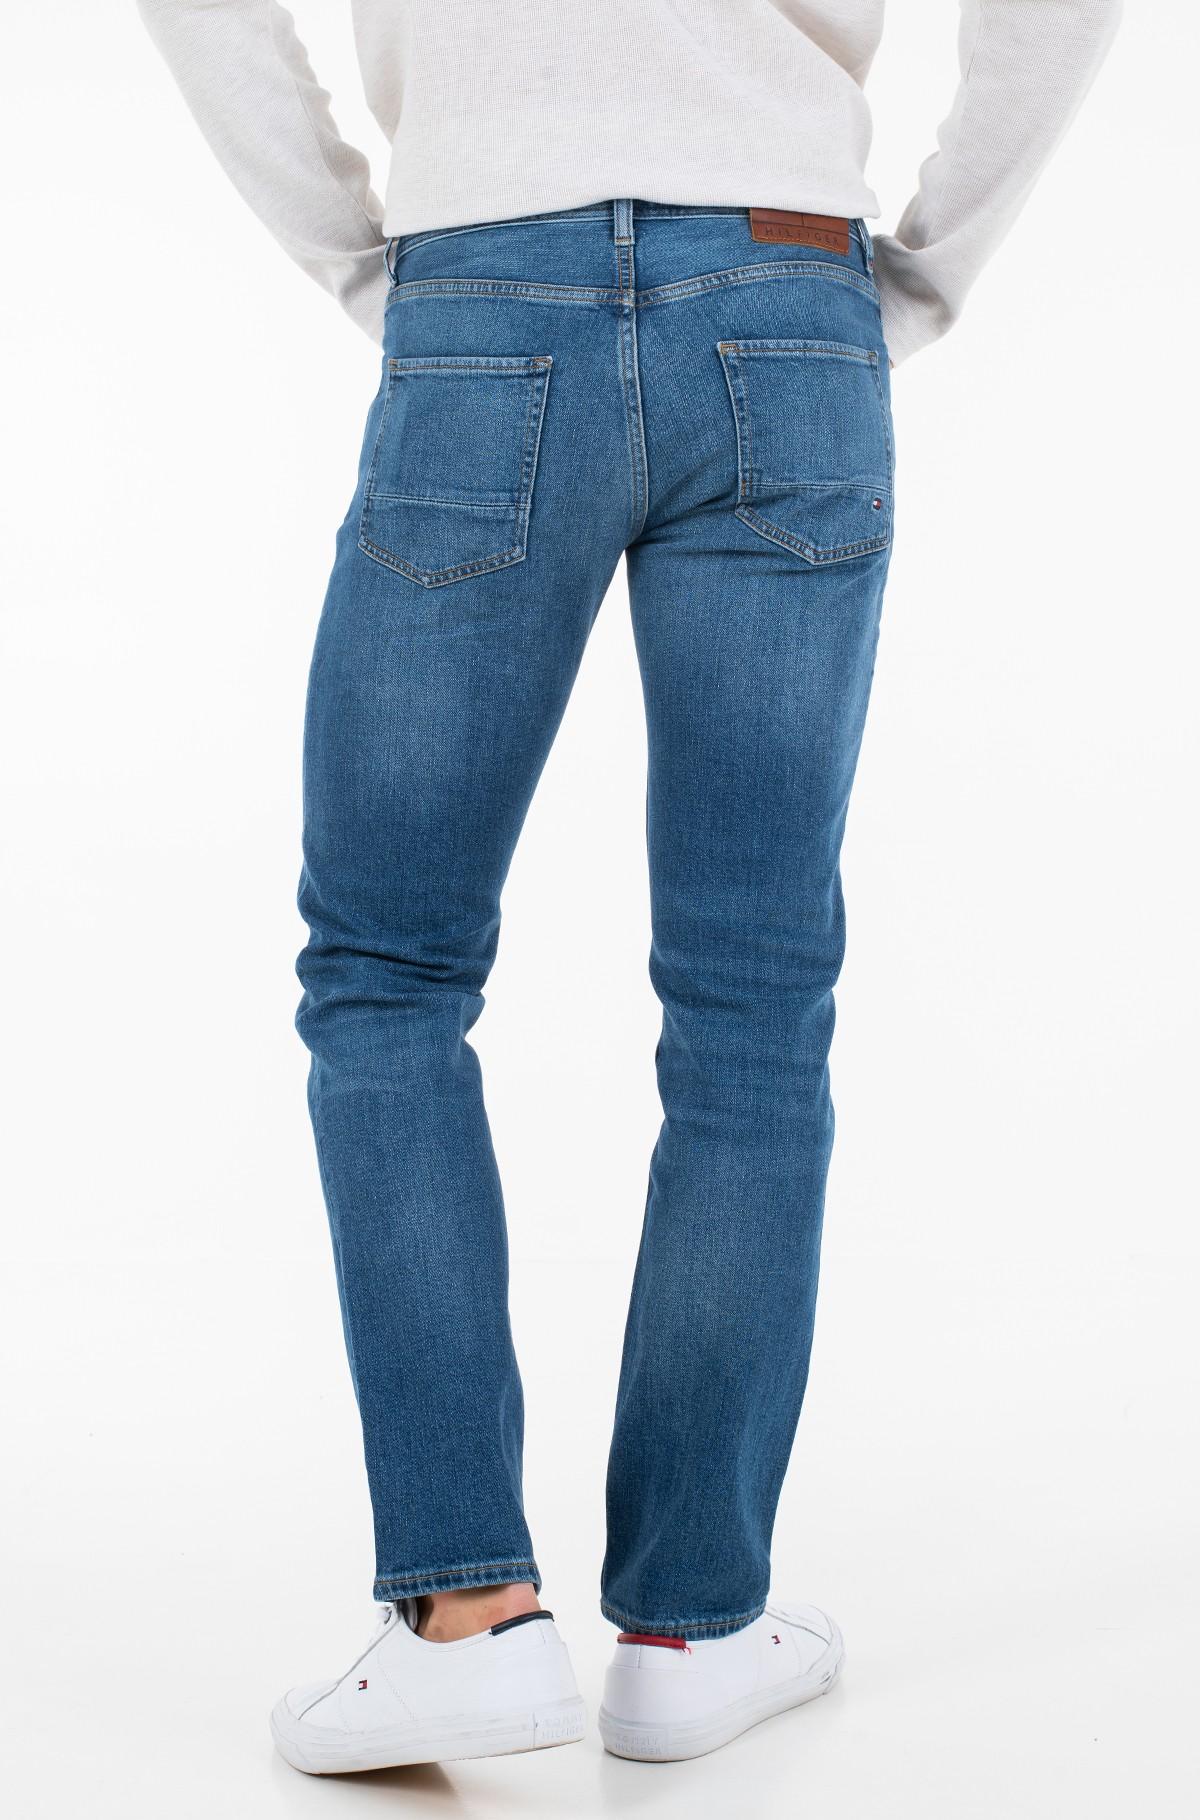 Džinsinės kelnės REGULAR MERCER STR BOSTON INDIGO-full-2